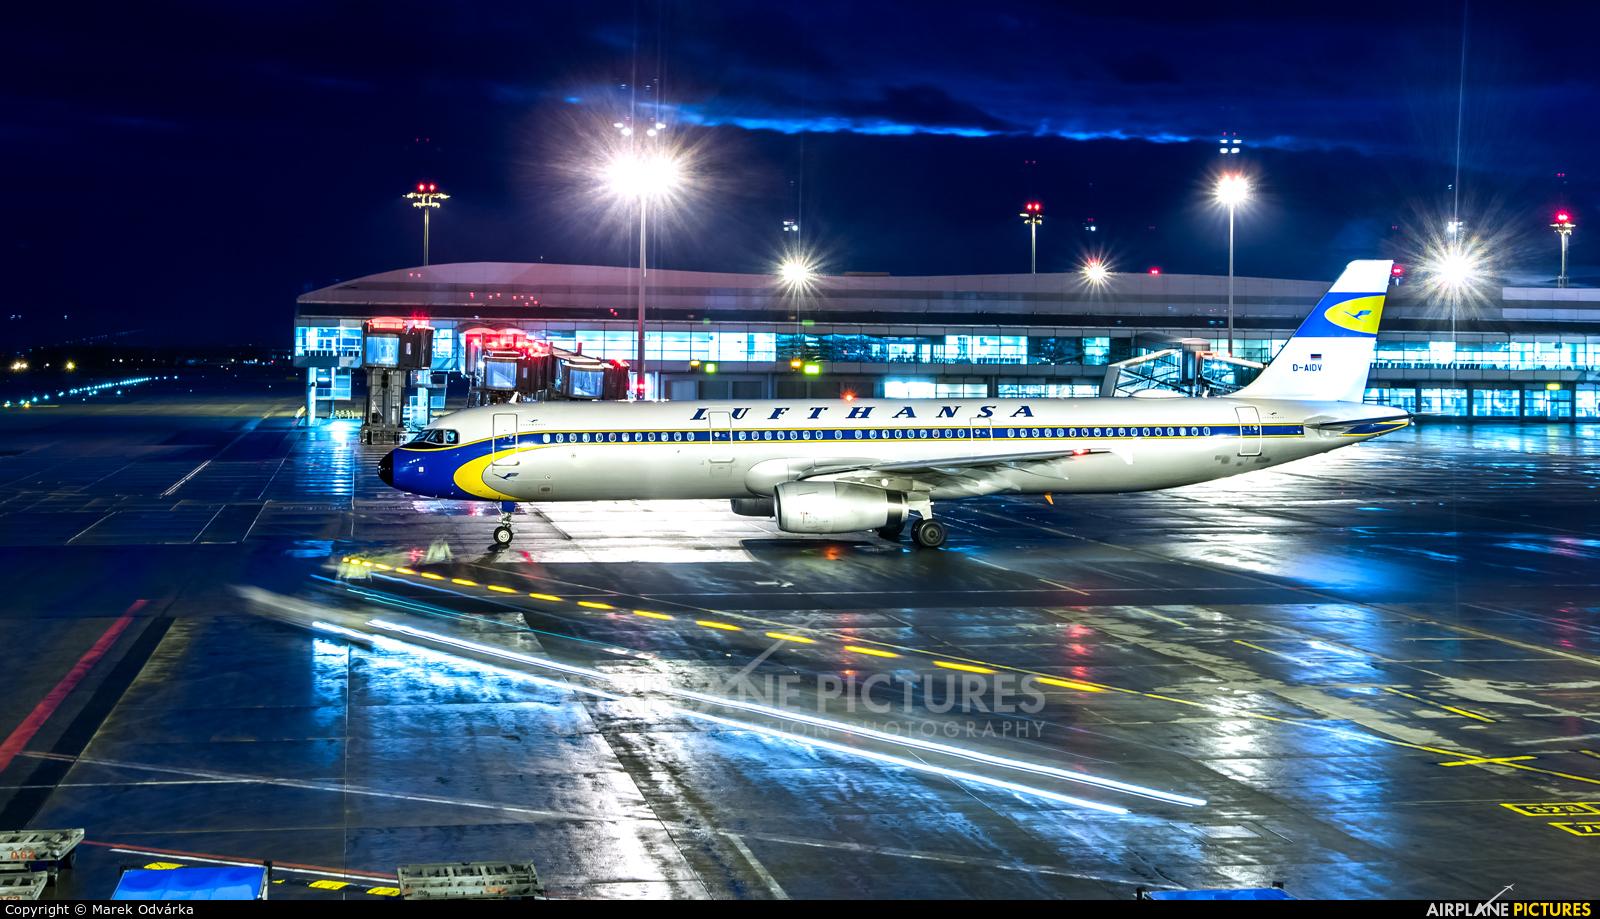 Lufthansa D-AIDV aircraft at Prague - Václav Havel